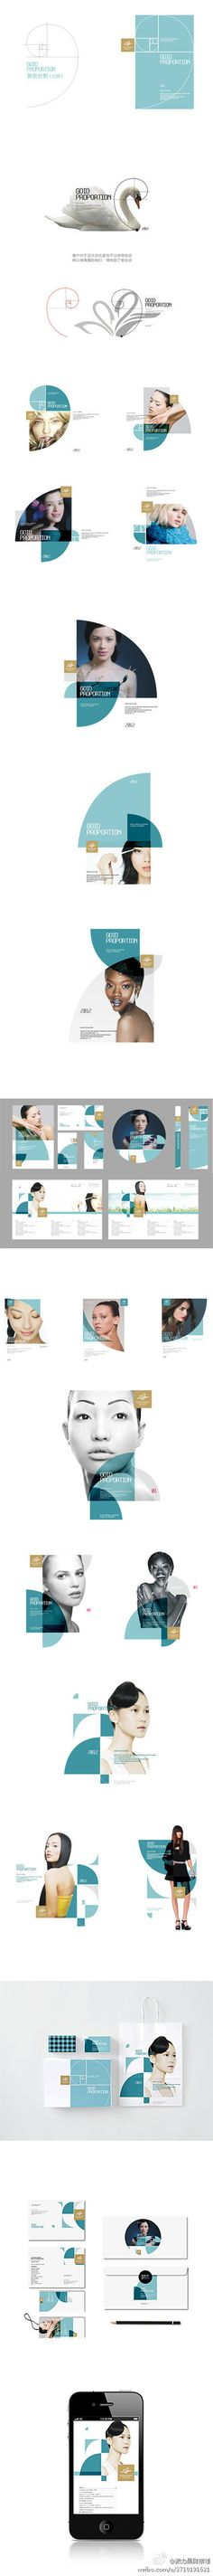 riceriver采集到Graphic(568图)_花瓣平面设计 #branding